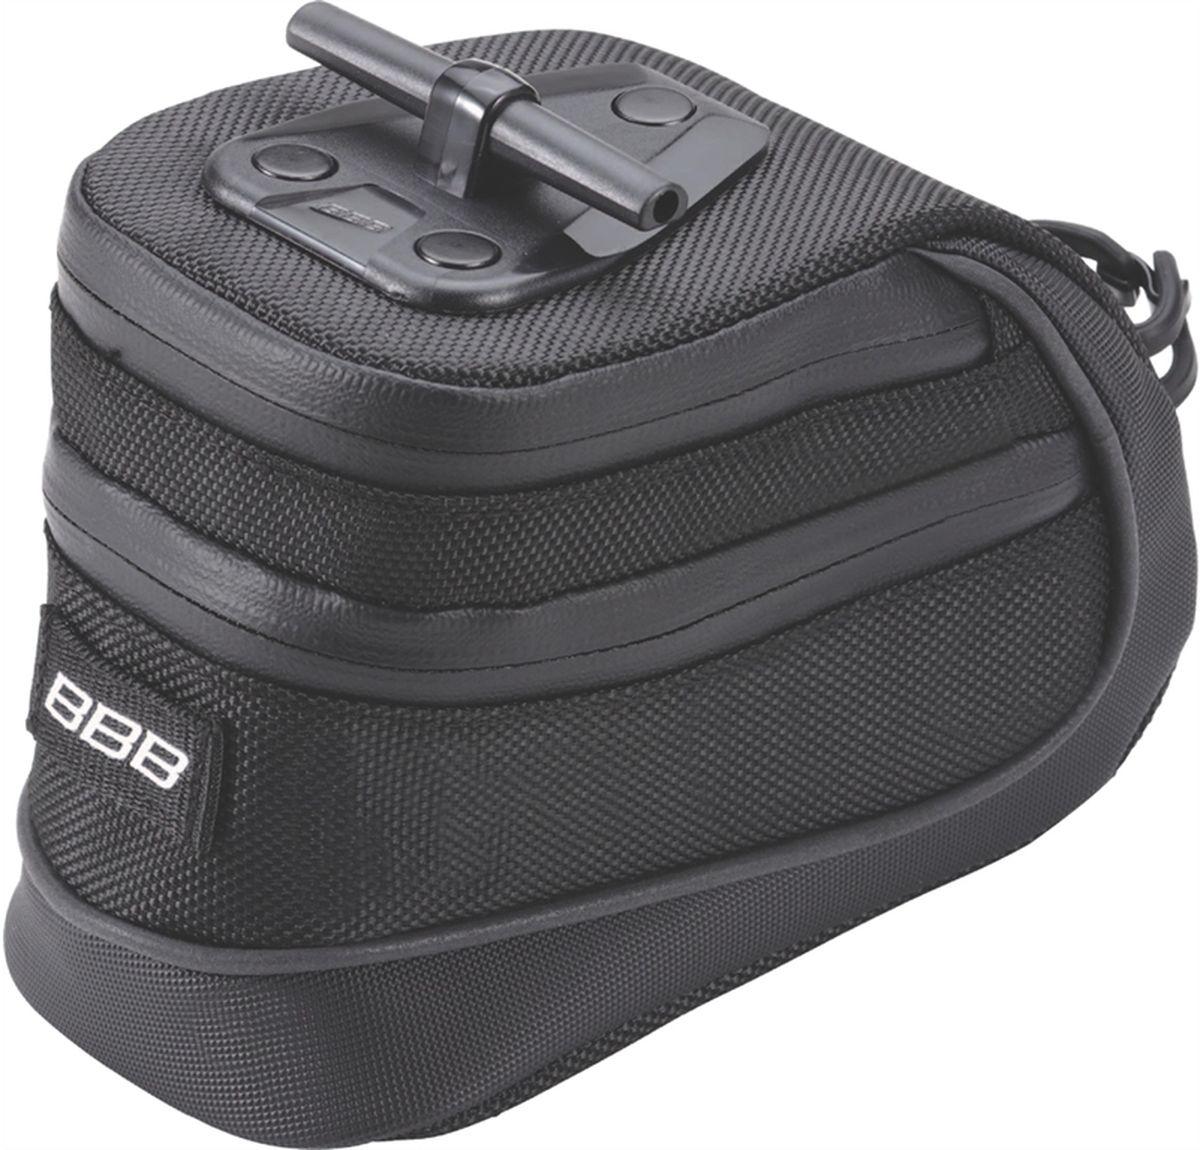 "Велосумка под седло BBB ""StorePack"", цвет: черный. Размер L BSB-12L"